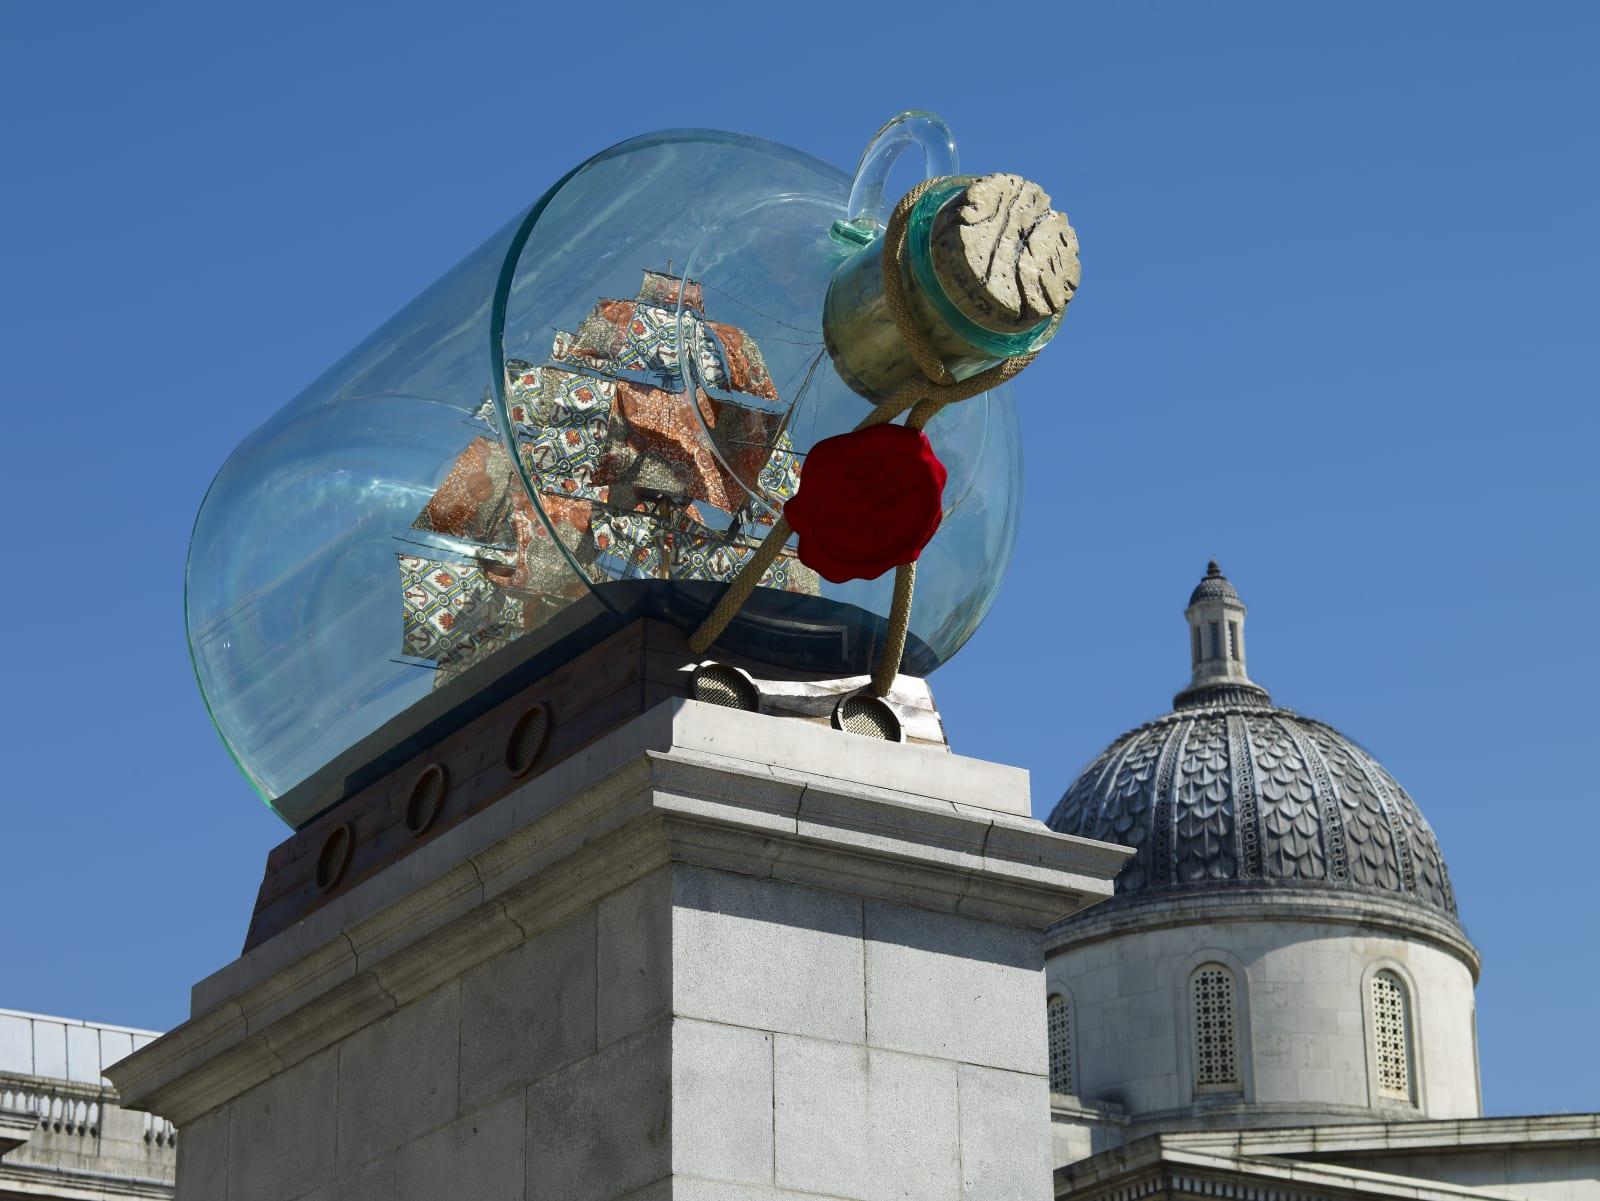 <p>Installation view:<i></i><i>Nelson's Ship in a Bottle</i>, Fourth Plinth Commission, Trafalgar Square, London (2010-2012)</p>